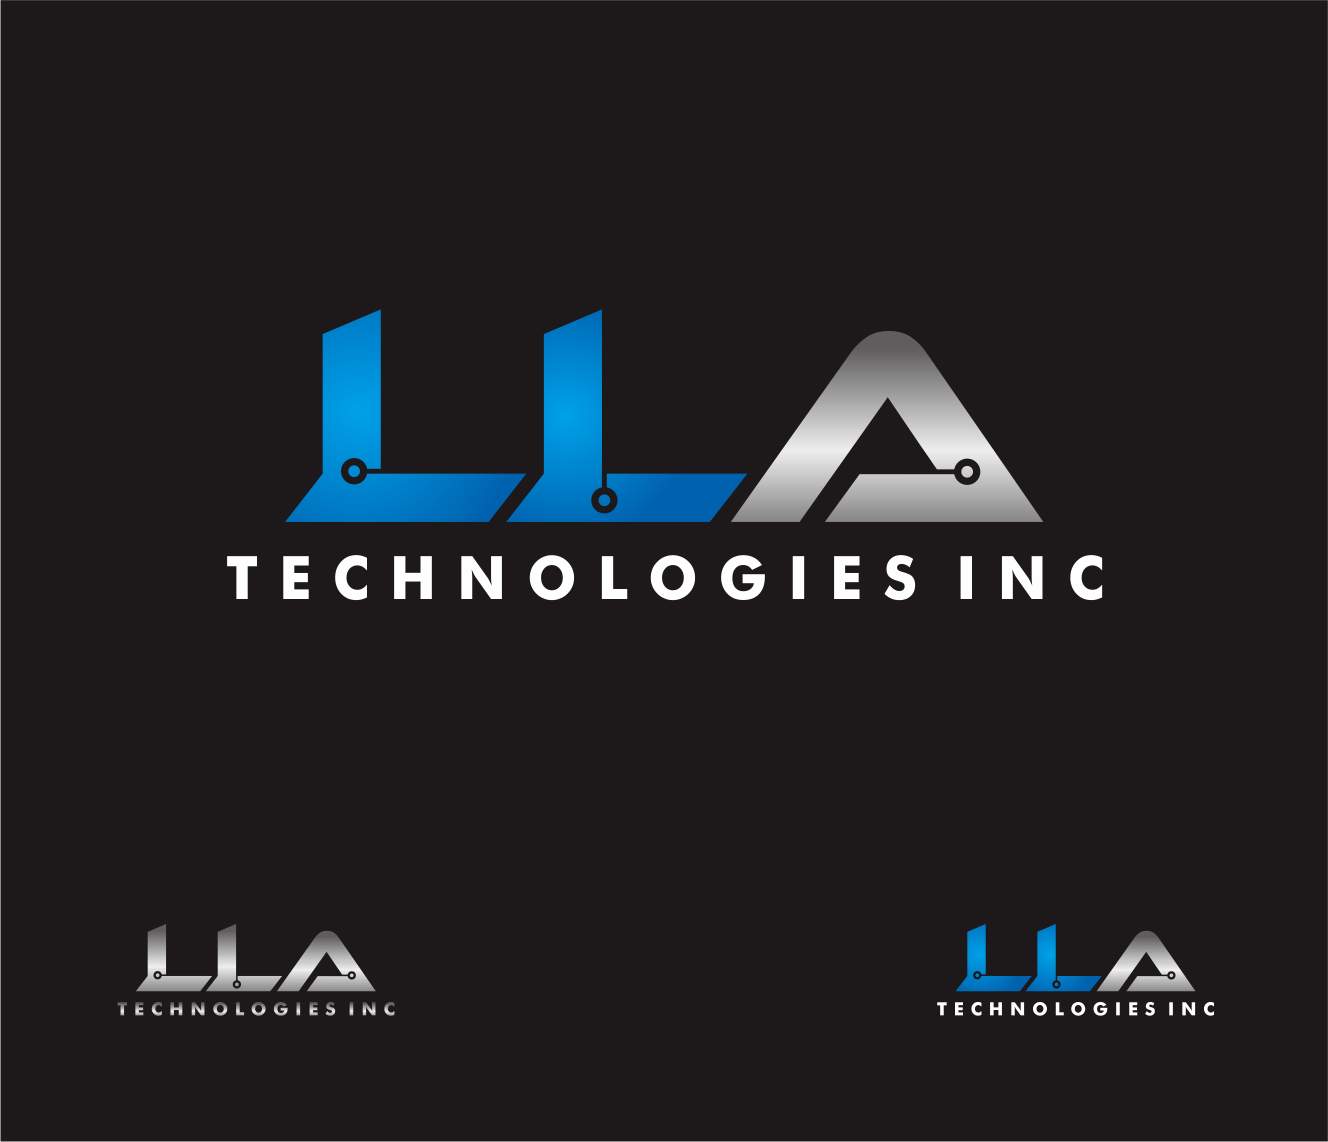 Logo Design by Armada Jamaluddin - Entry No. 151 in the Logo Design Contest Inspiring Logo Design for LLA Technologies Inc..